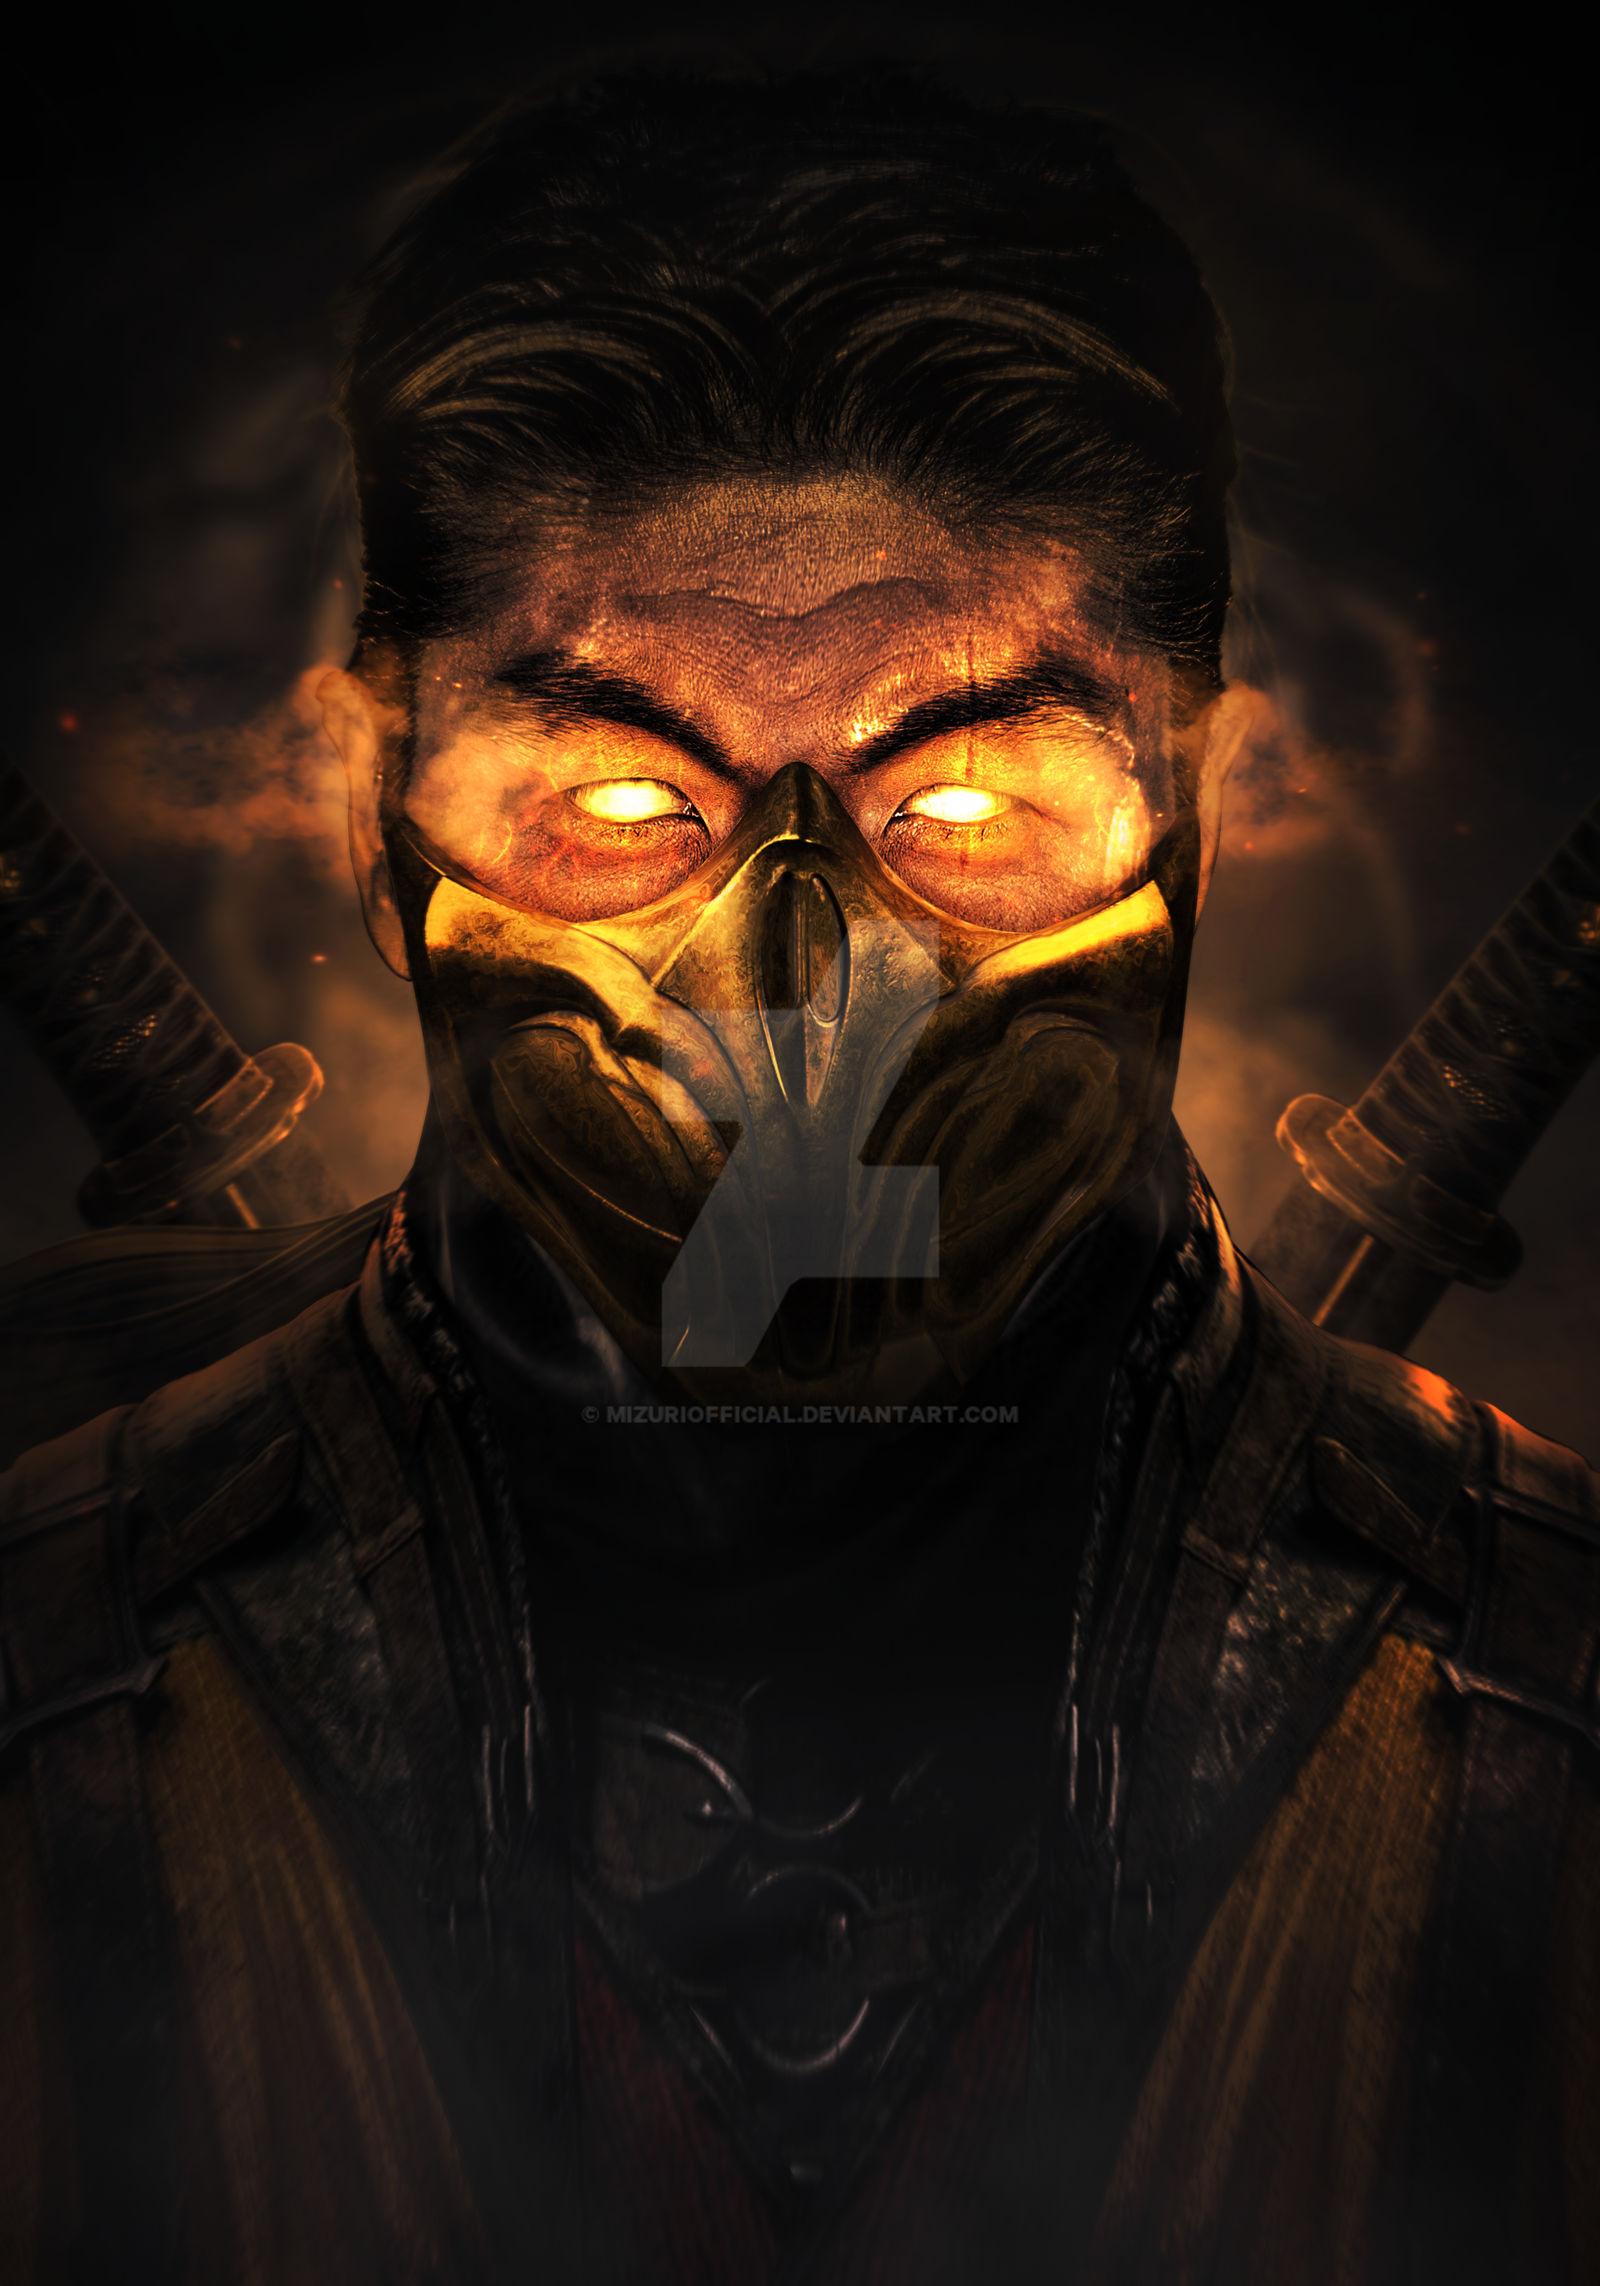 Mortal Kombat 11 Scorpion Brian Tee By Mizuriofficial On